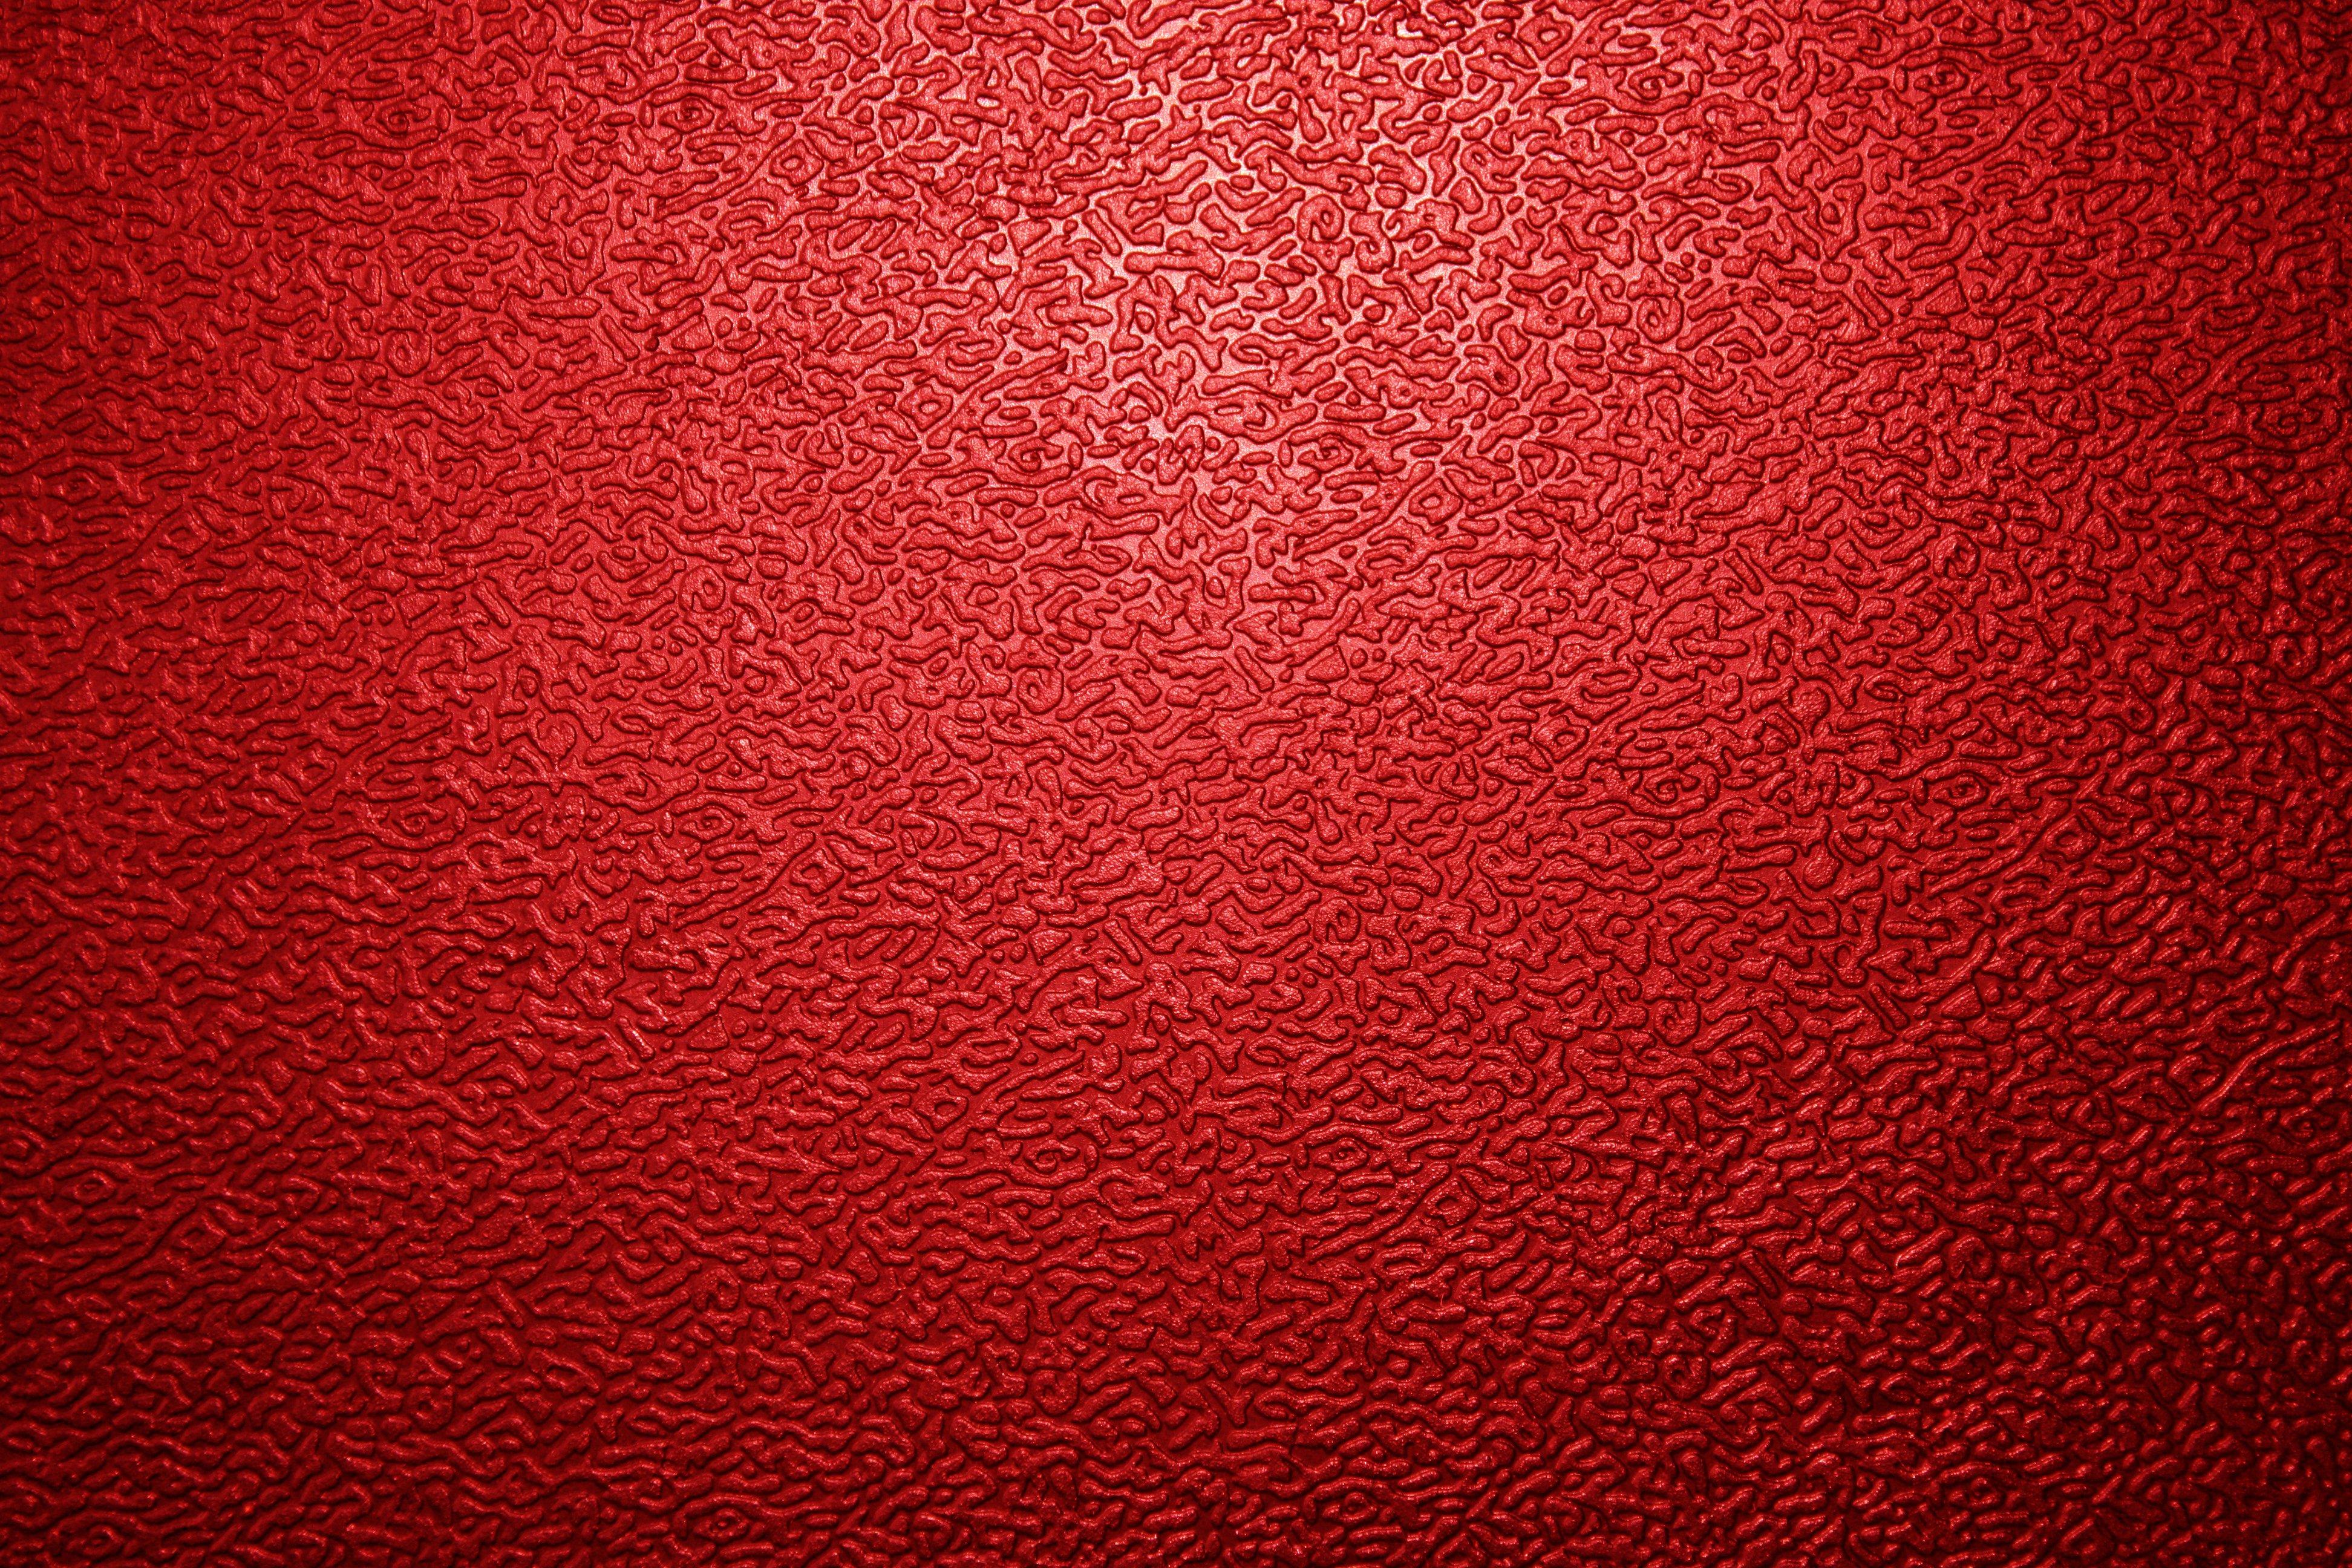 red wallpaper 8 3888x2592